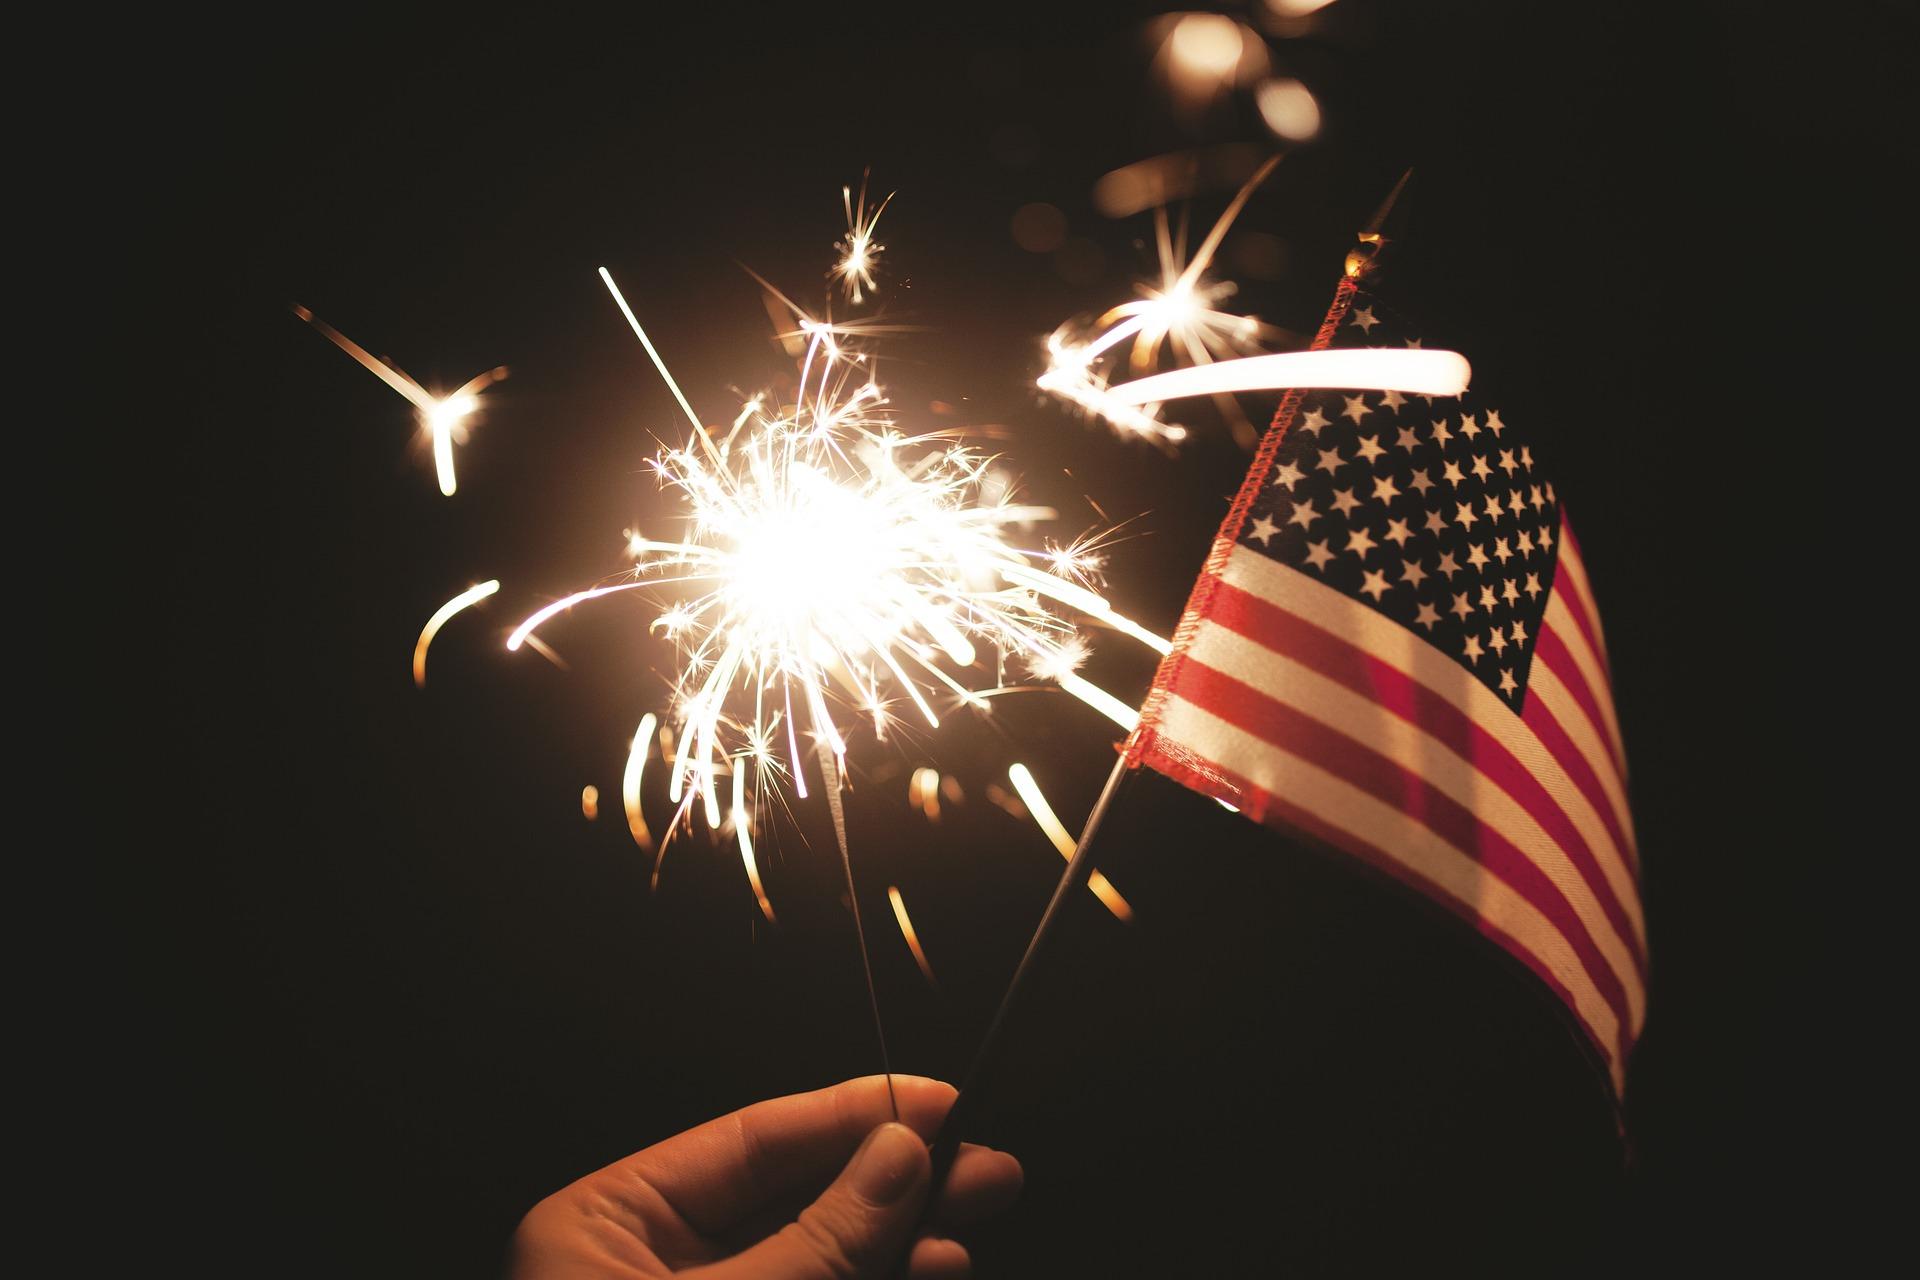 American Flag & Firework Sparkler